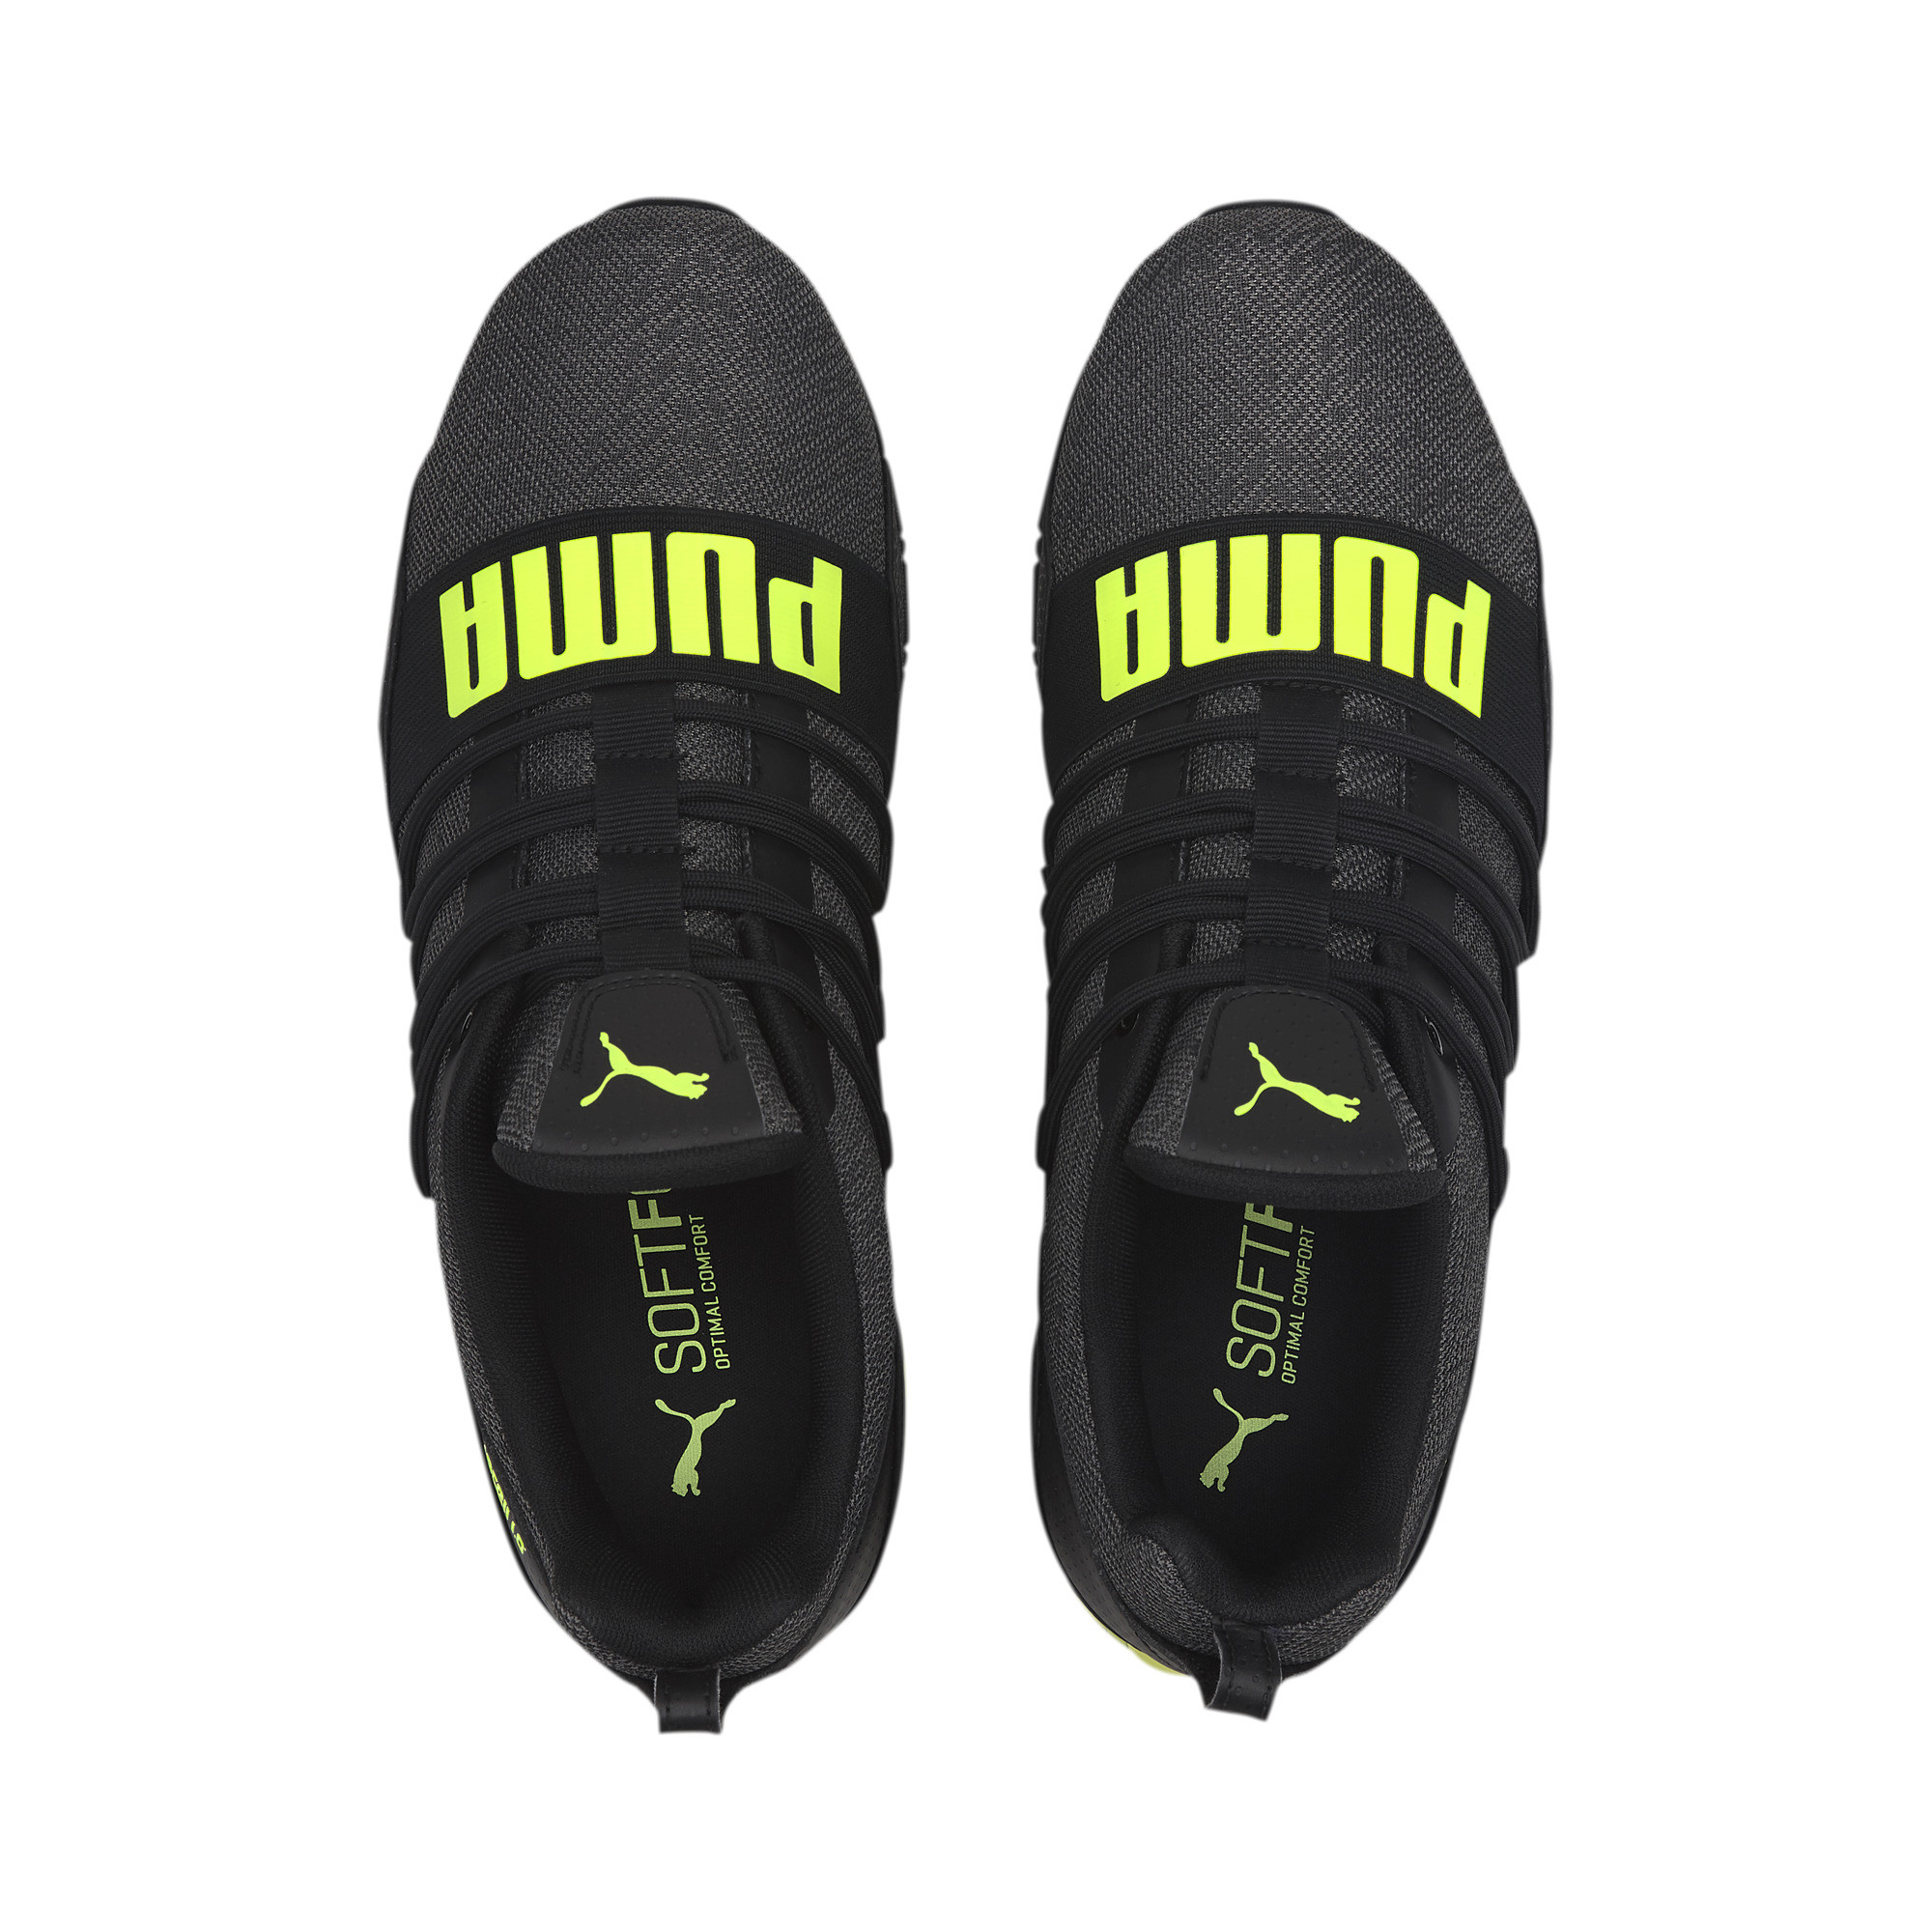 PUMA-Men-039-s-CELL-Regulate-Bold-Training-Shoes thumbnail 22